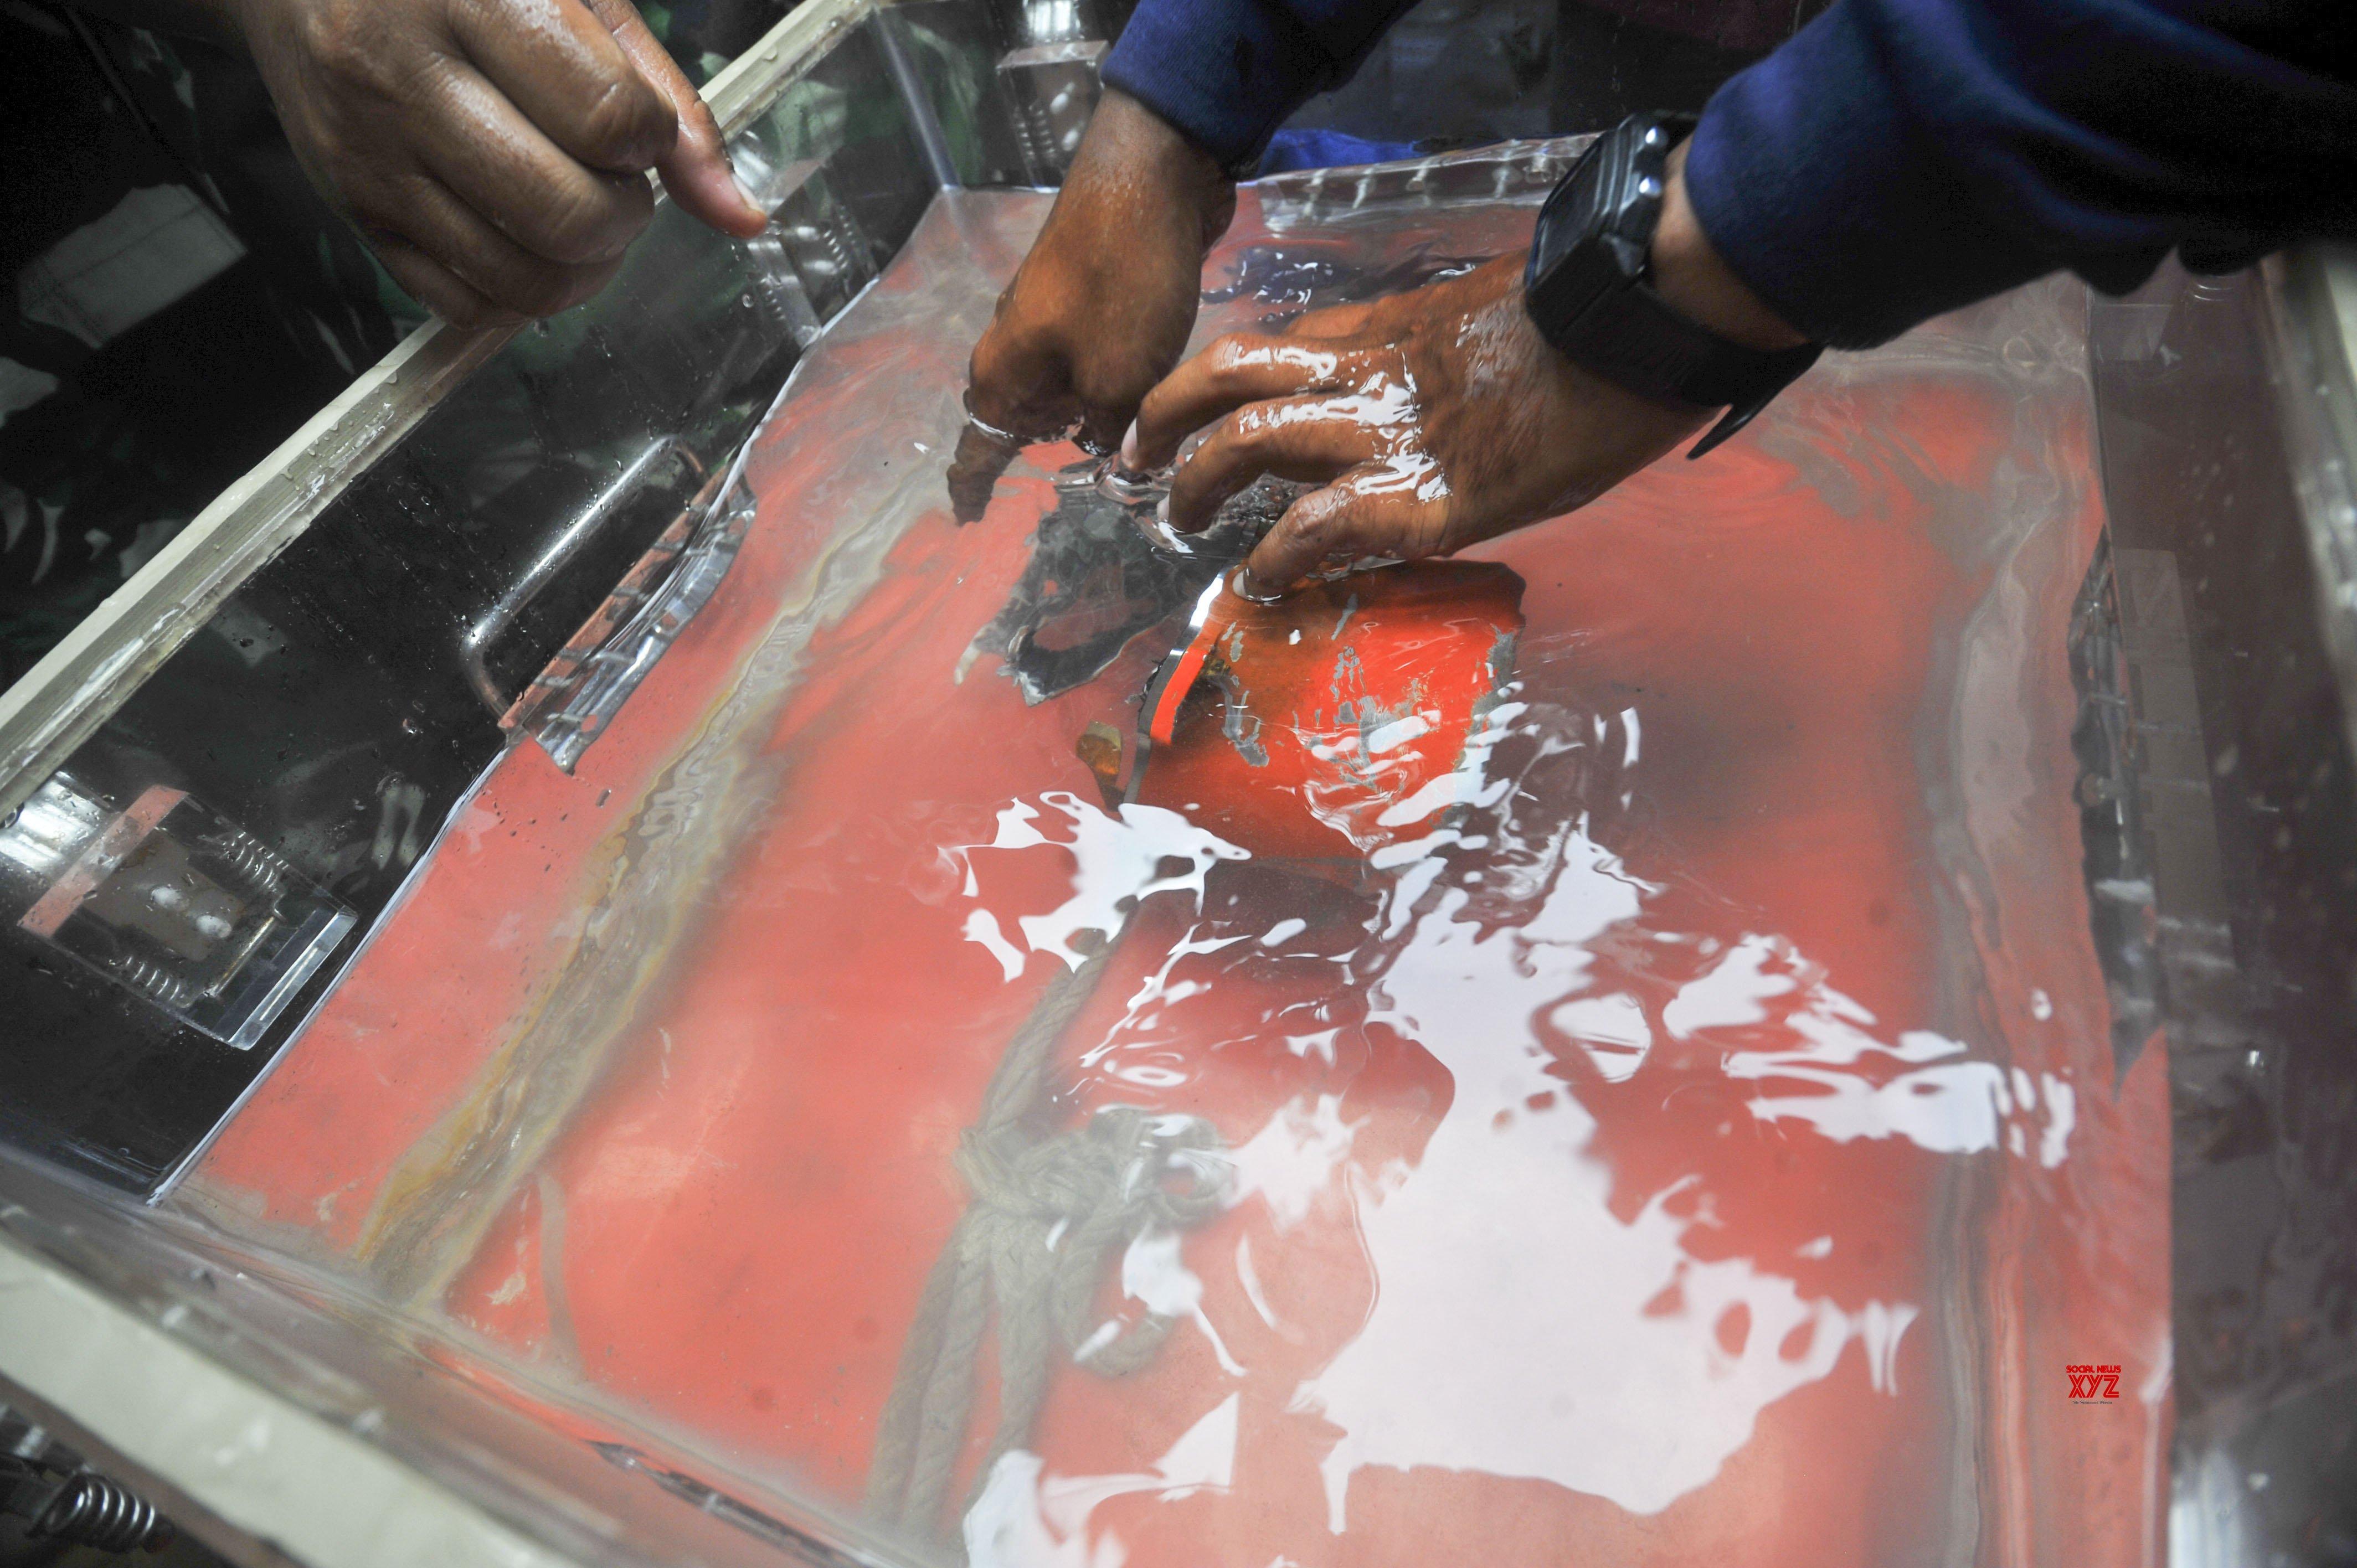 INDONESIA - KARAWANG - LION AIR JT 610 - CRASH - CVR #Gallery